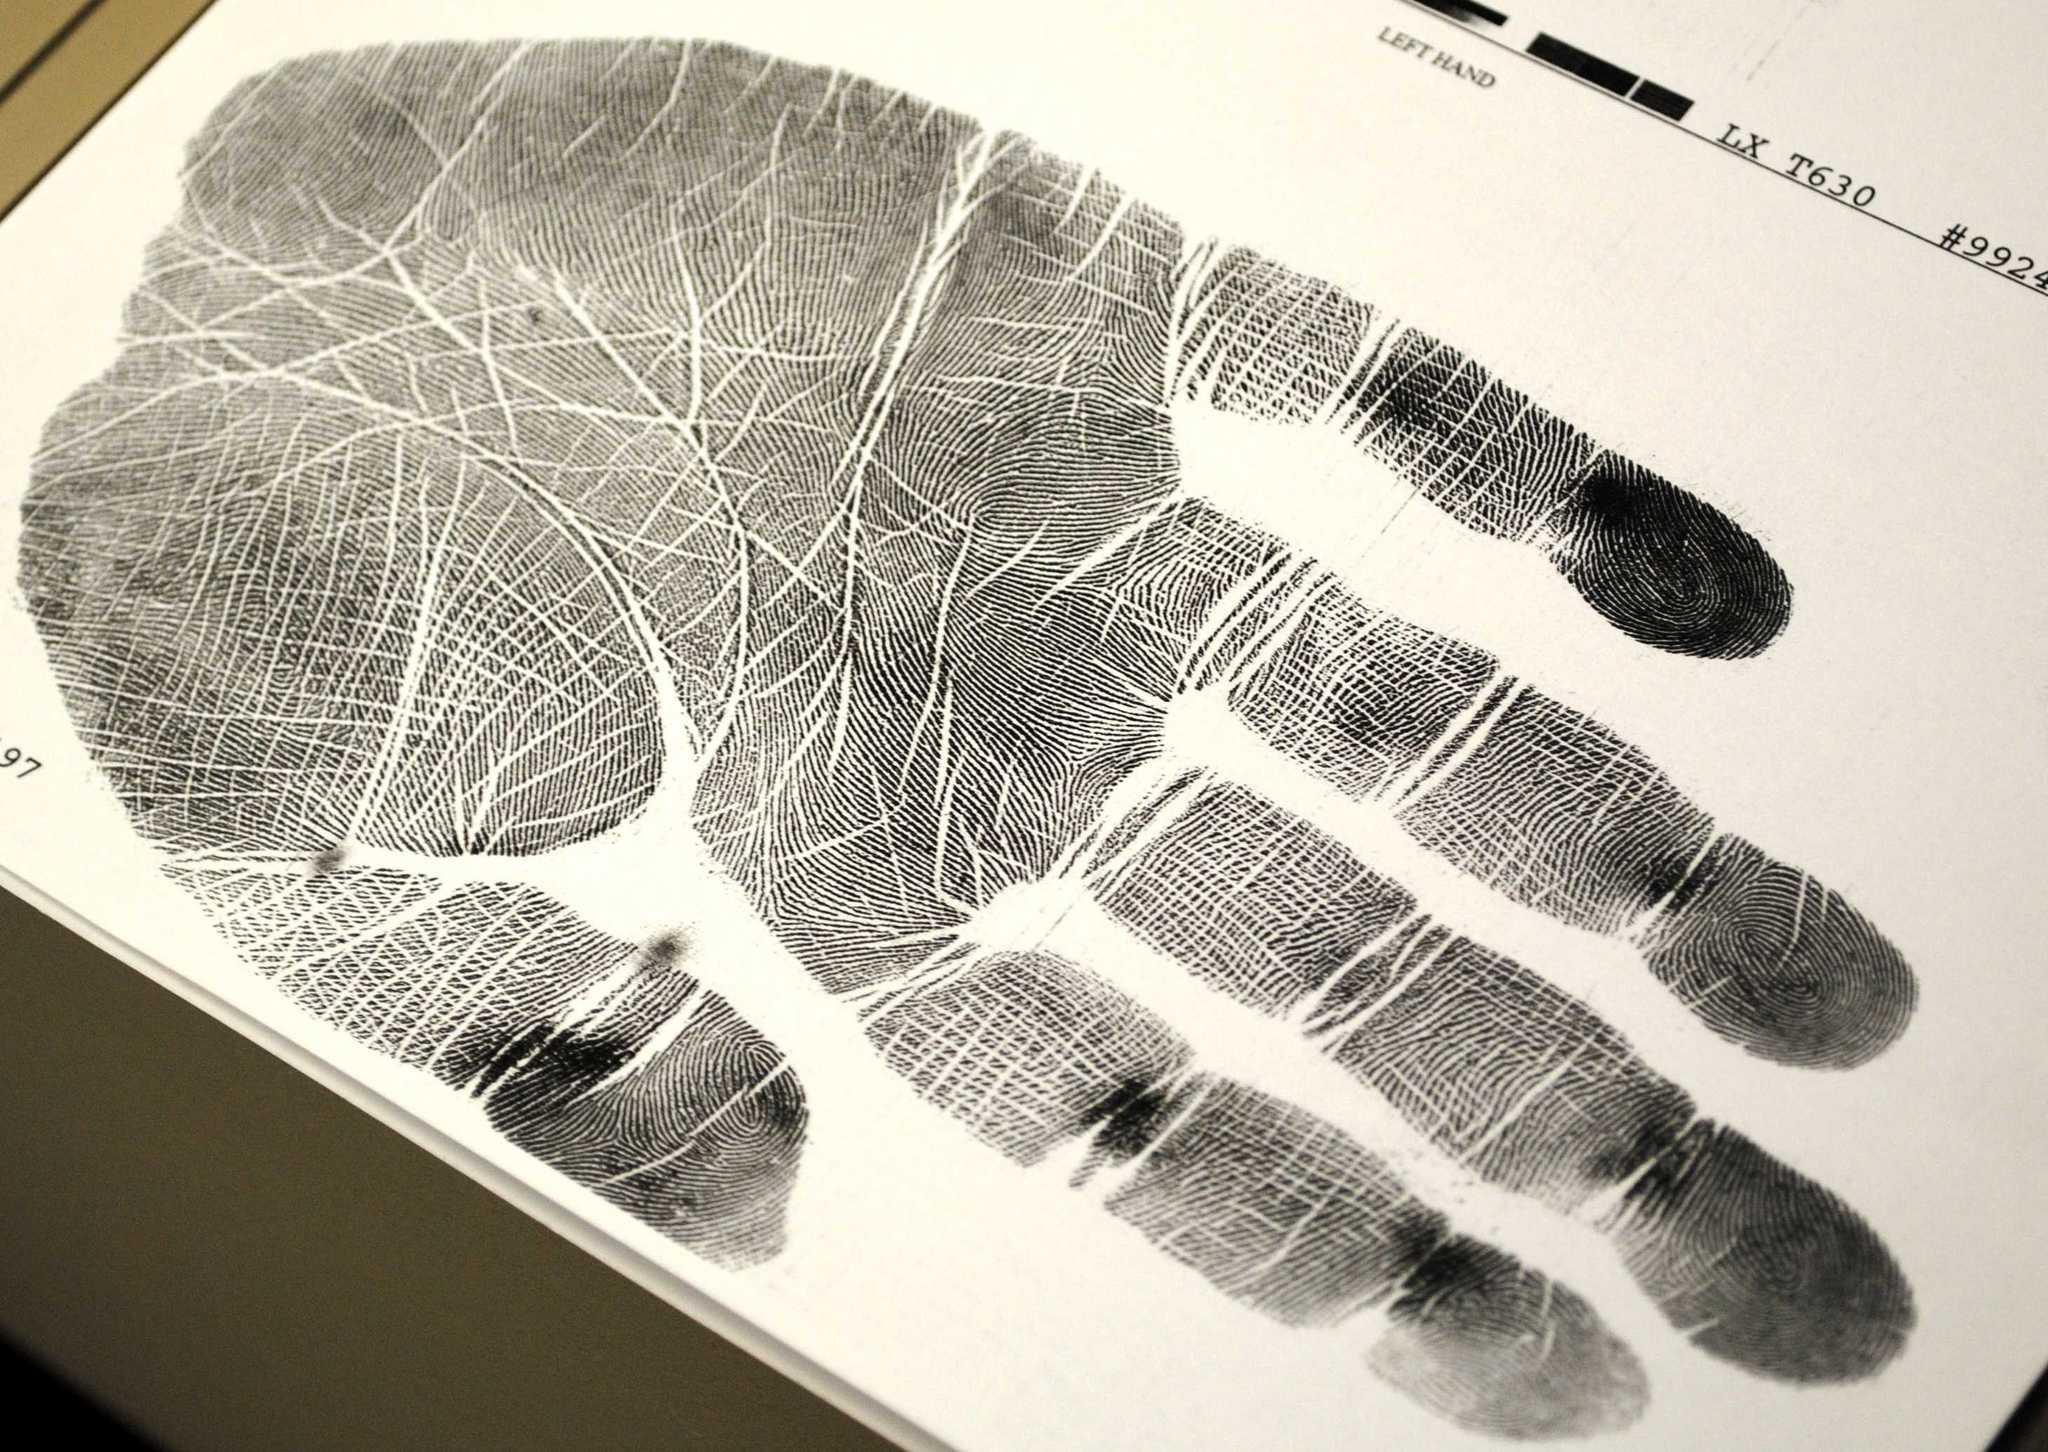 Forensic News New Data Standard Provides Improved Enhancement Of Fingerprints Author Jennifer Chase